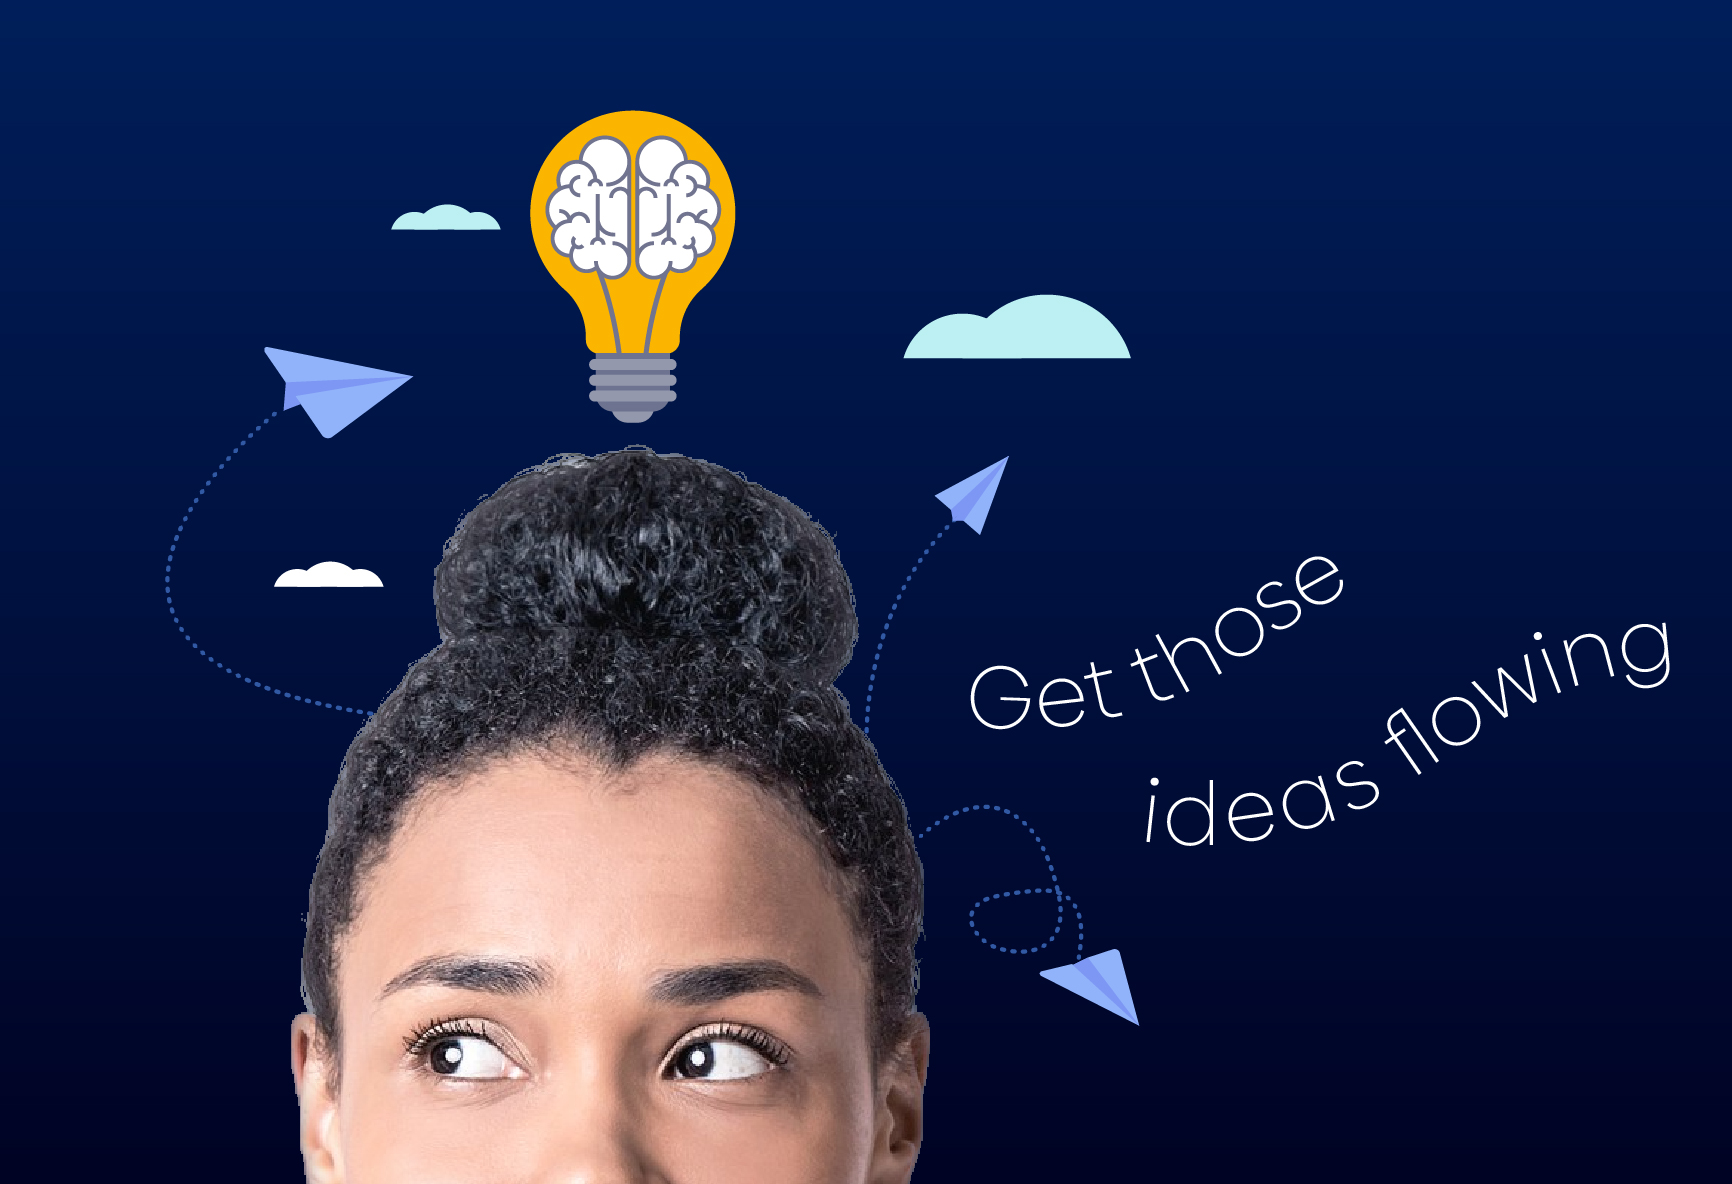 A.D. Creativity - Get the ideas flowing